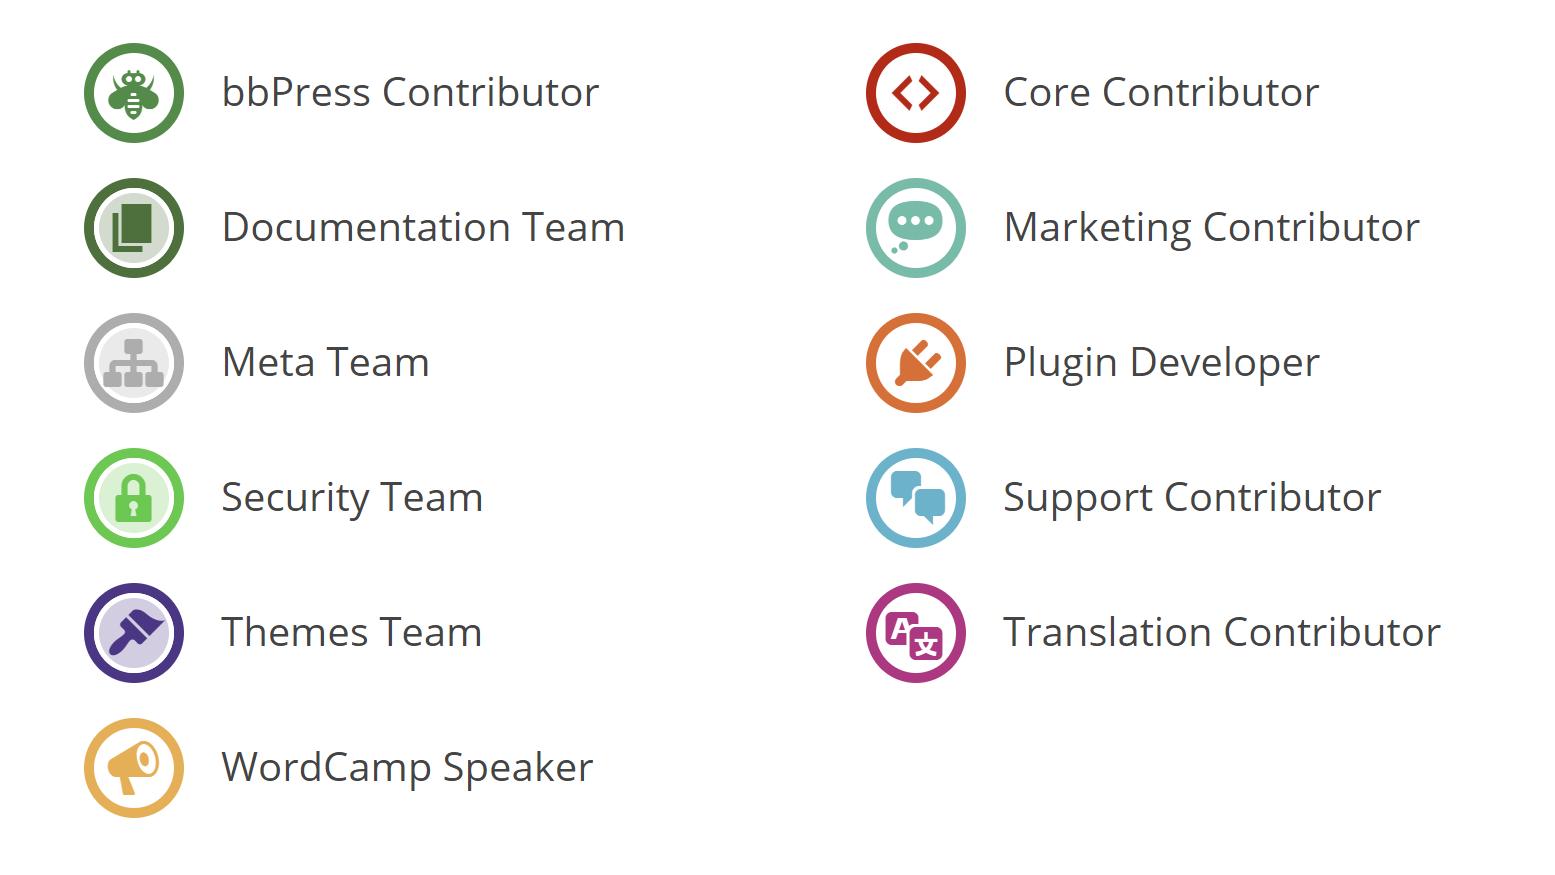 Wordcamp出勤徽章可能是一件好事,但是那是错误的讨论WordCamp出勤徽章可能是一件好事,但这是错误的讨论